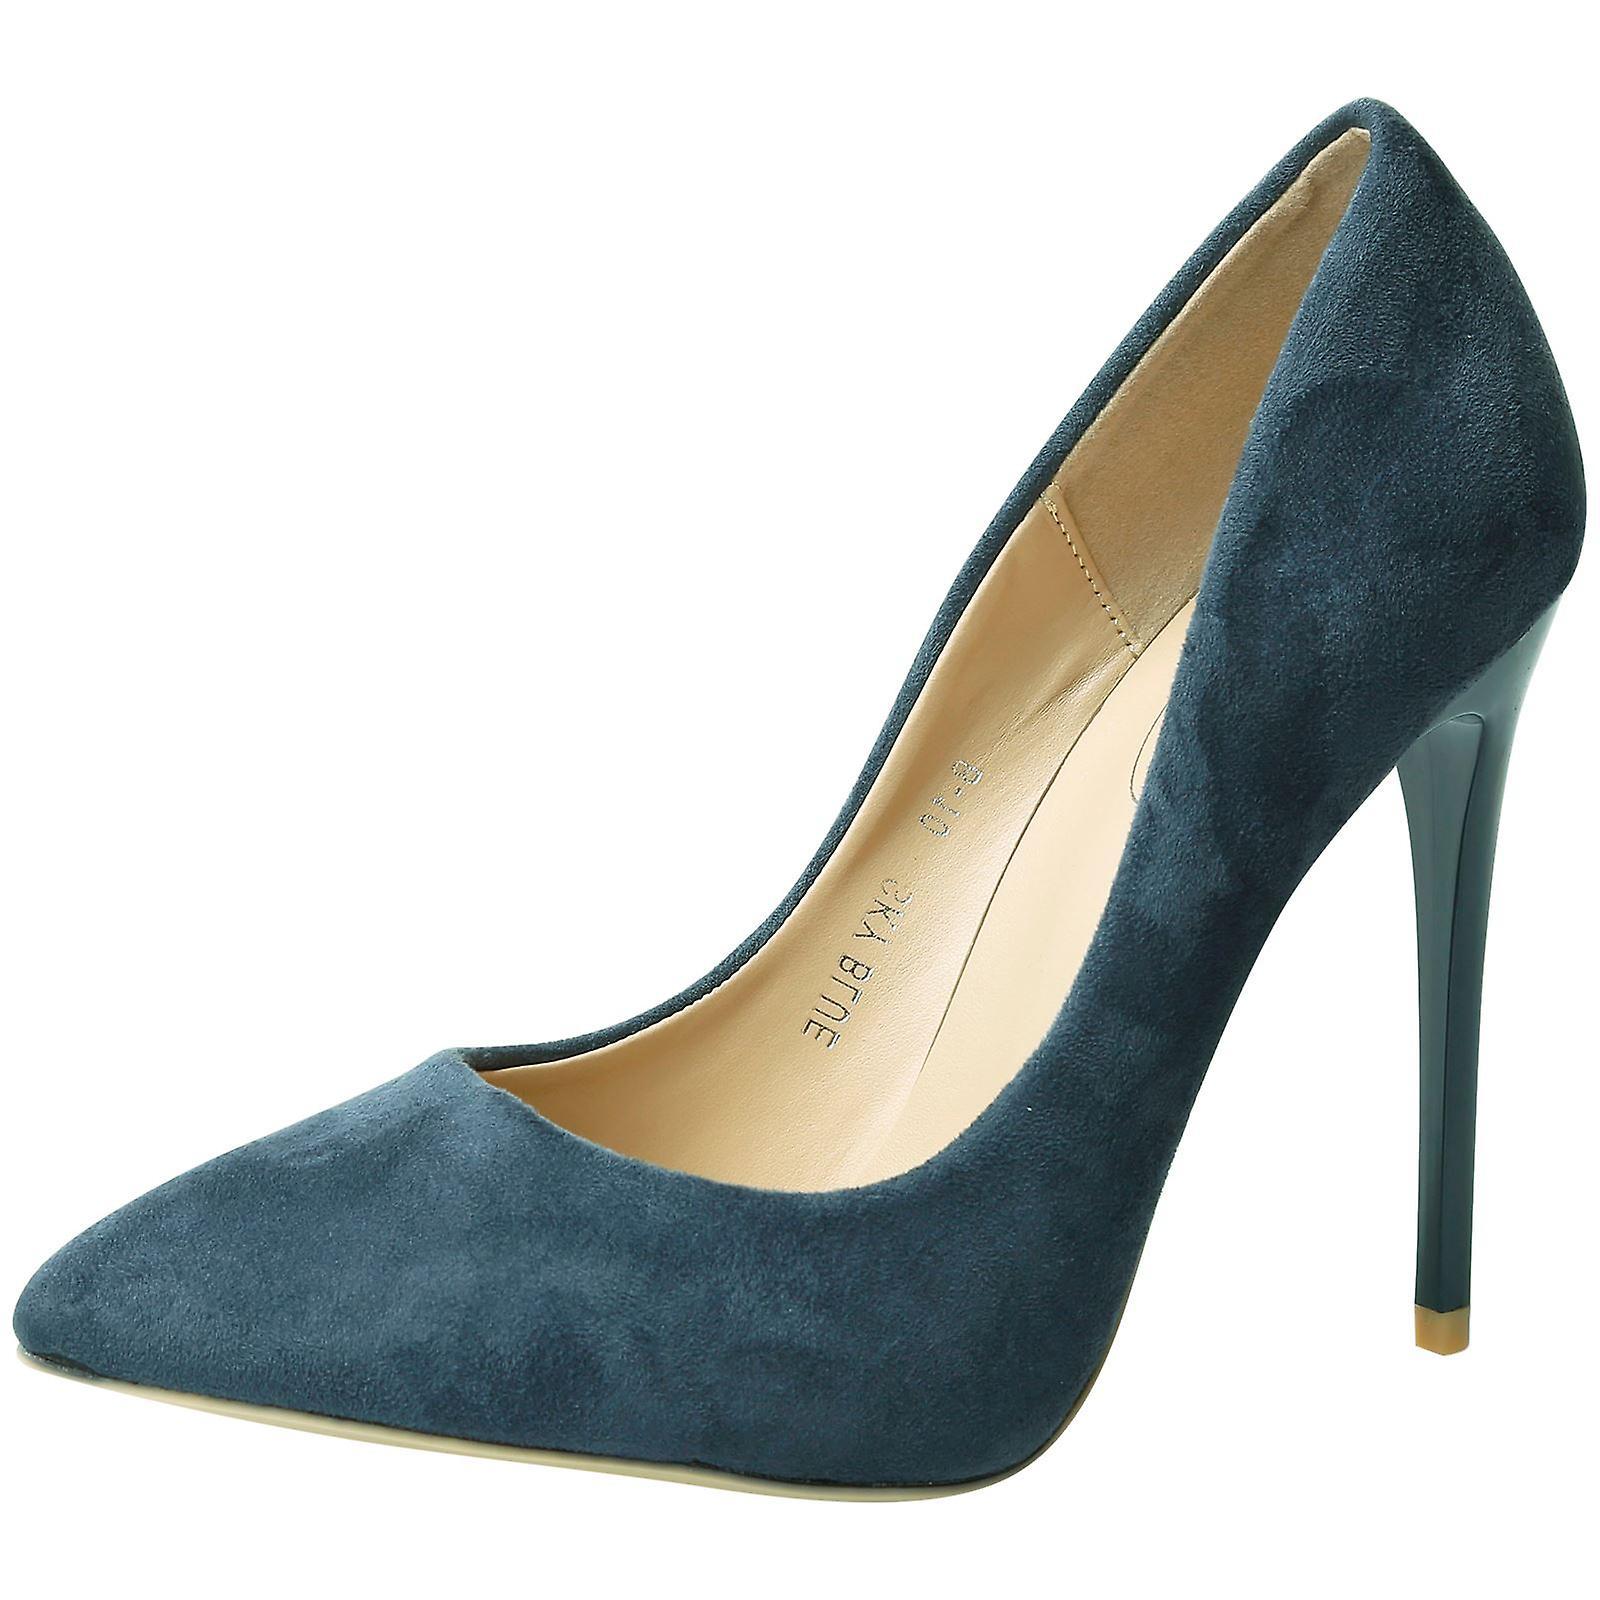 Danita Womens High Stiletto Heel Pointed Toe Court Shoes